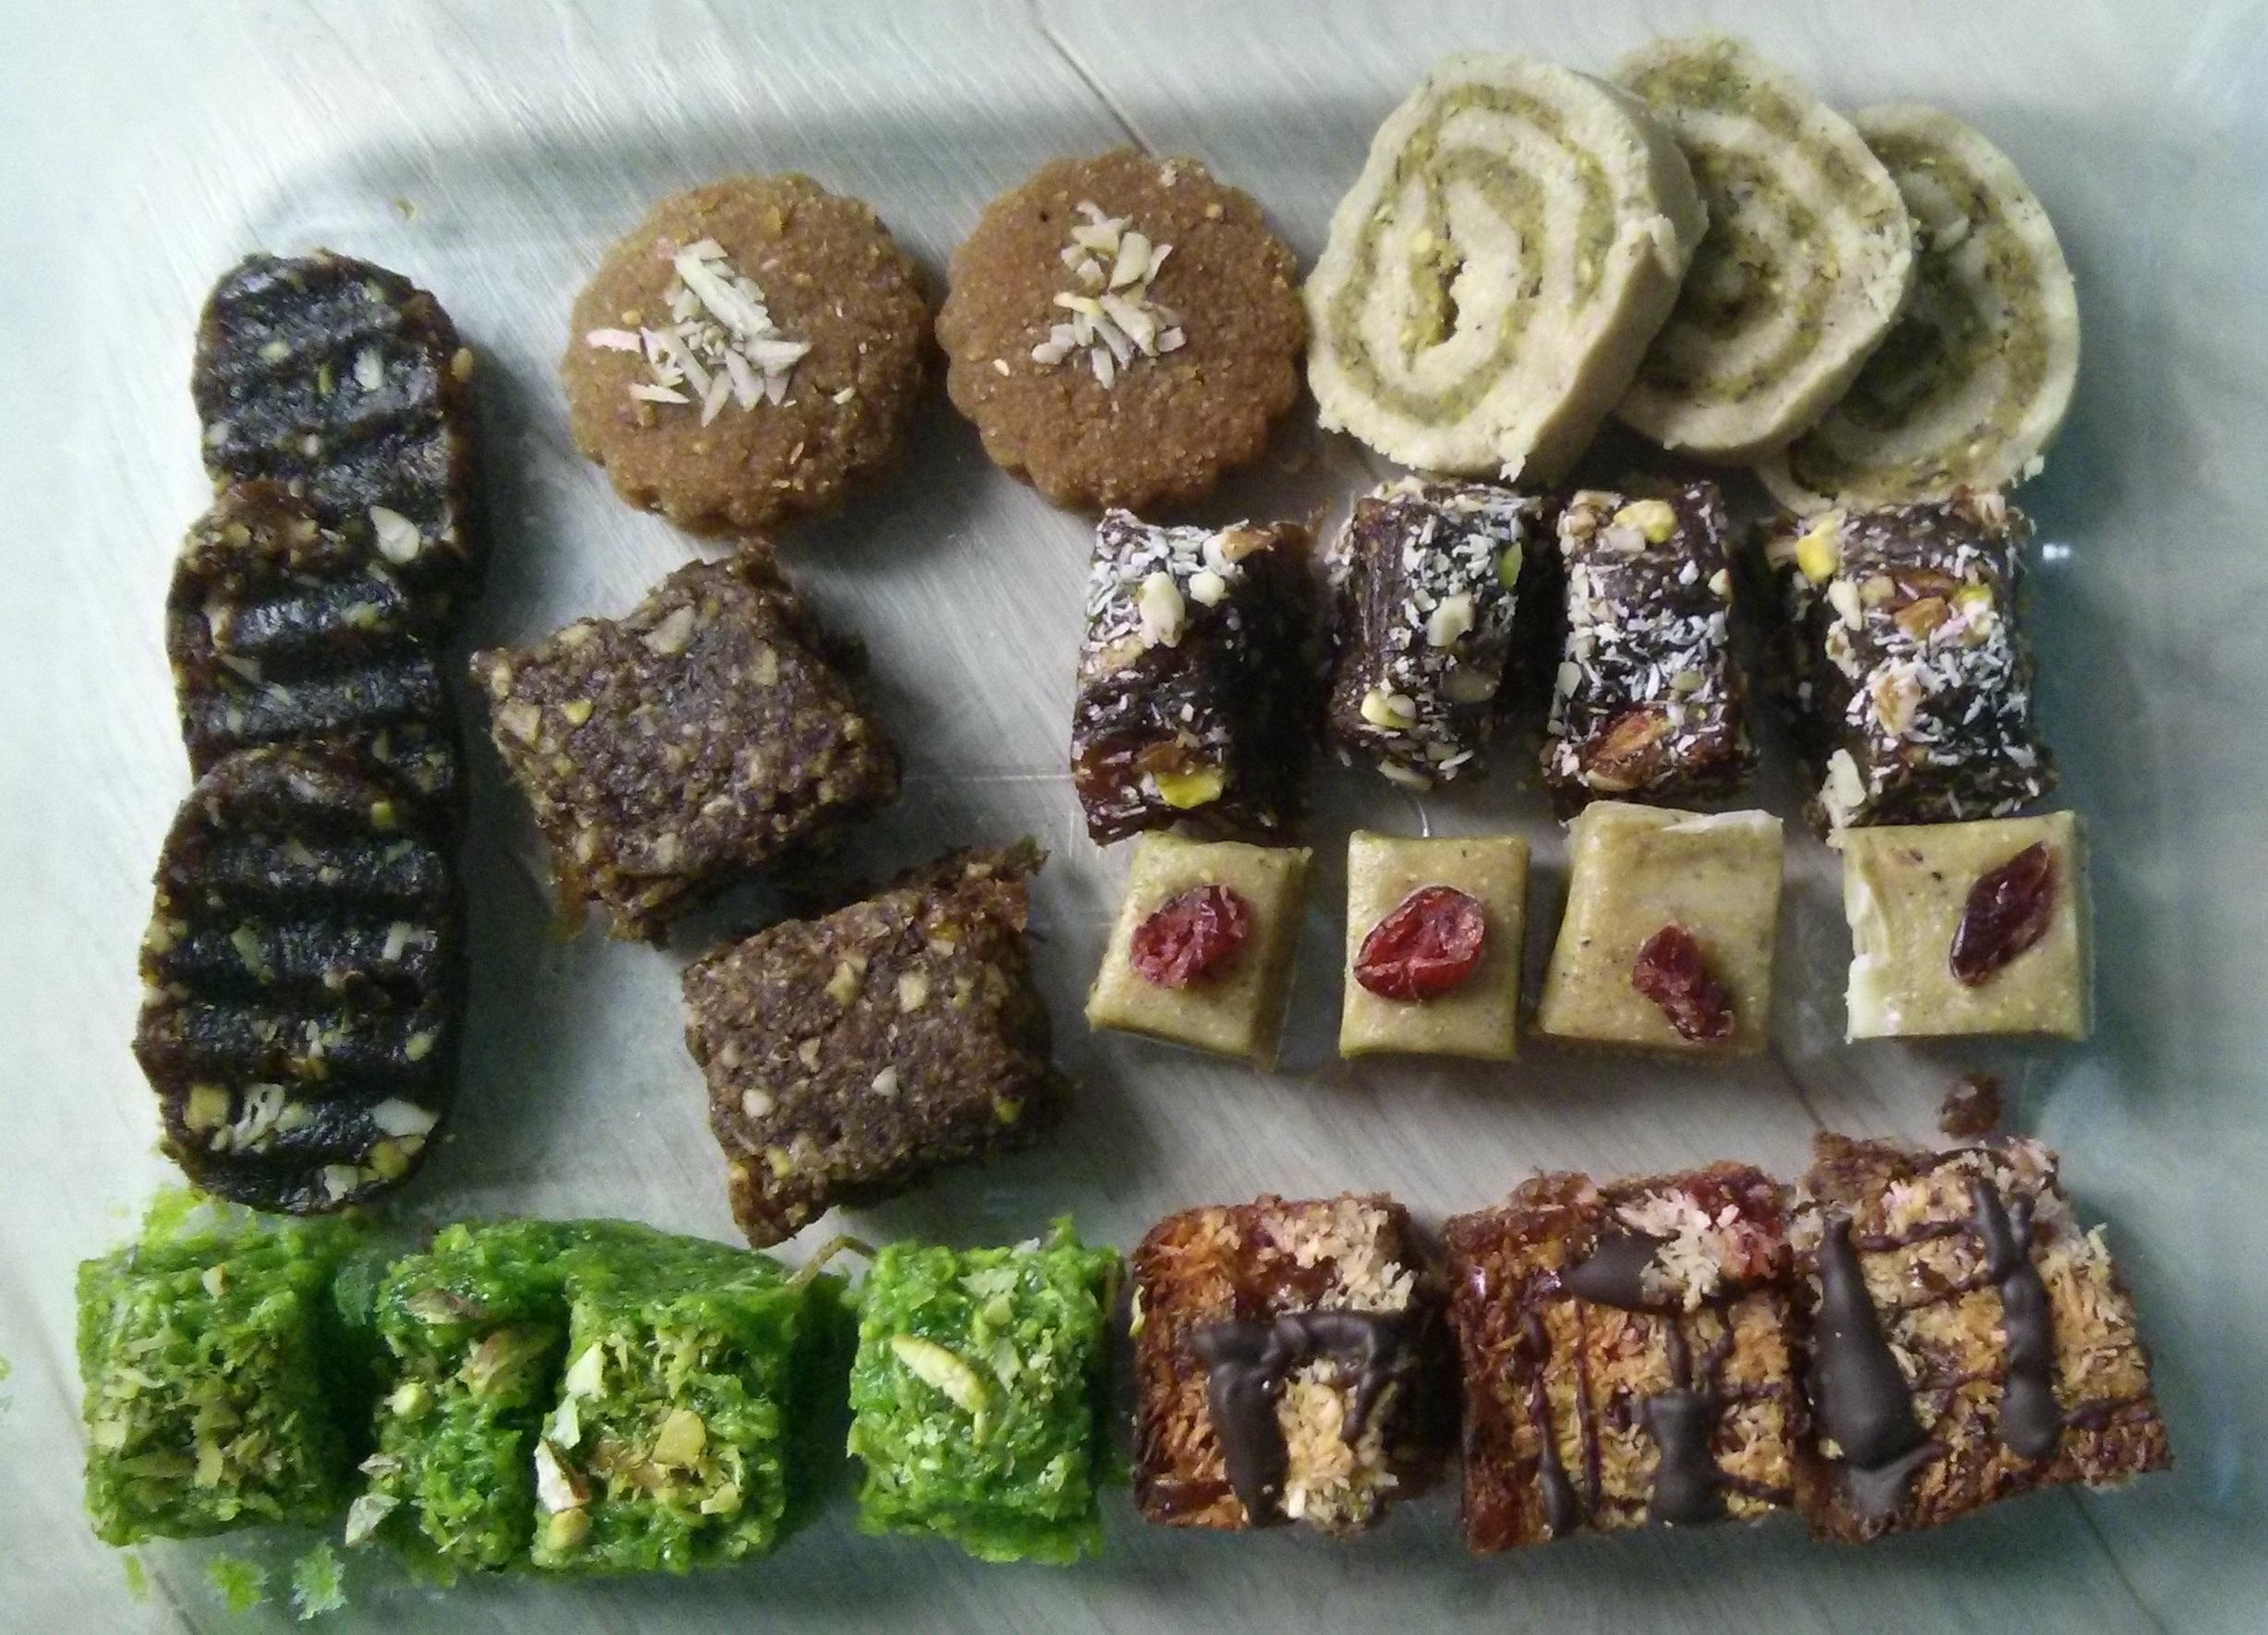 Link: Vegan and Jain Mitthai sharing event